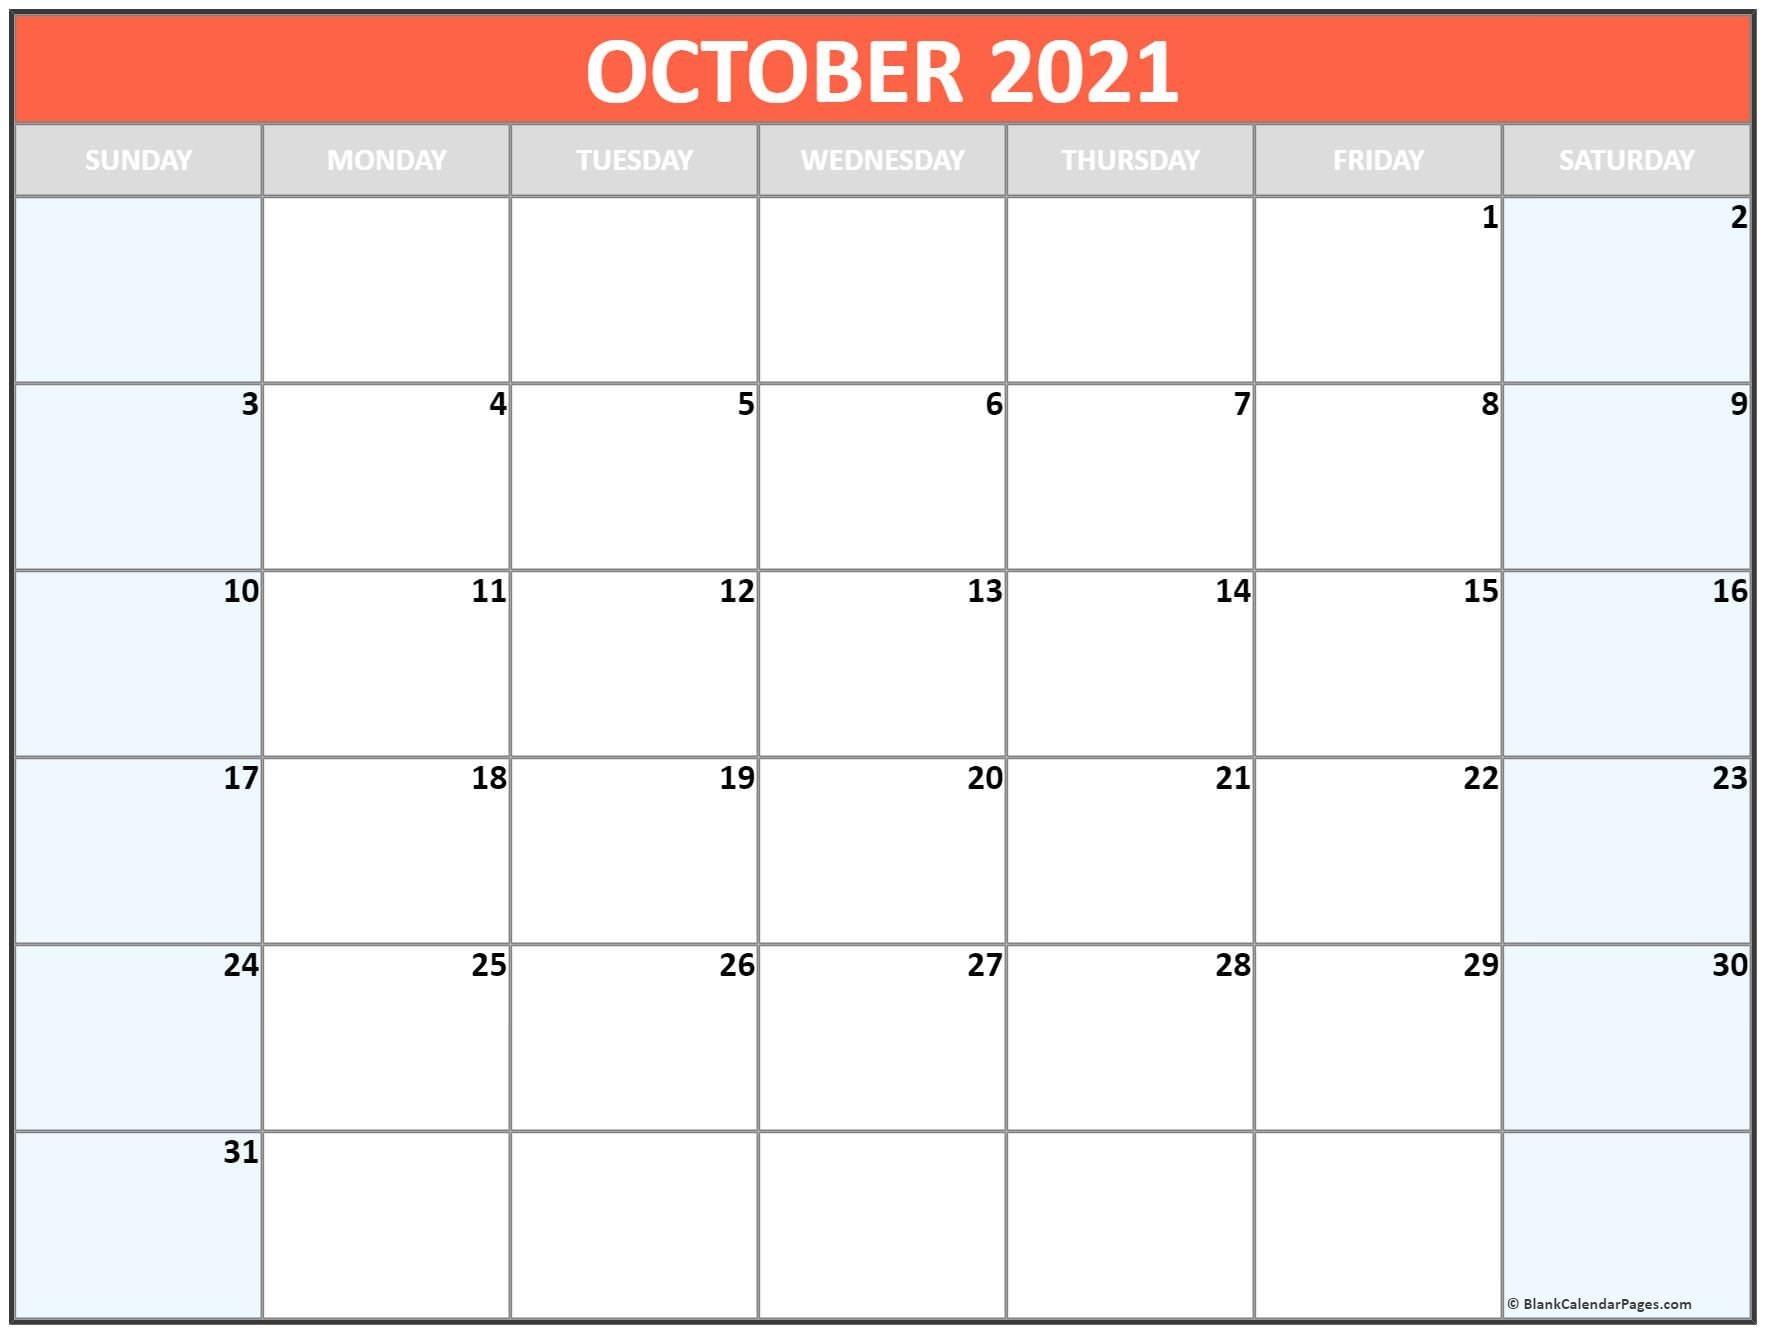 October 2021 Blank Calendar Templates.-2021 Printable Calendar From October Thru December